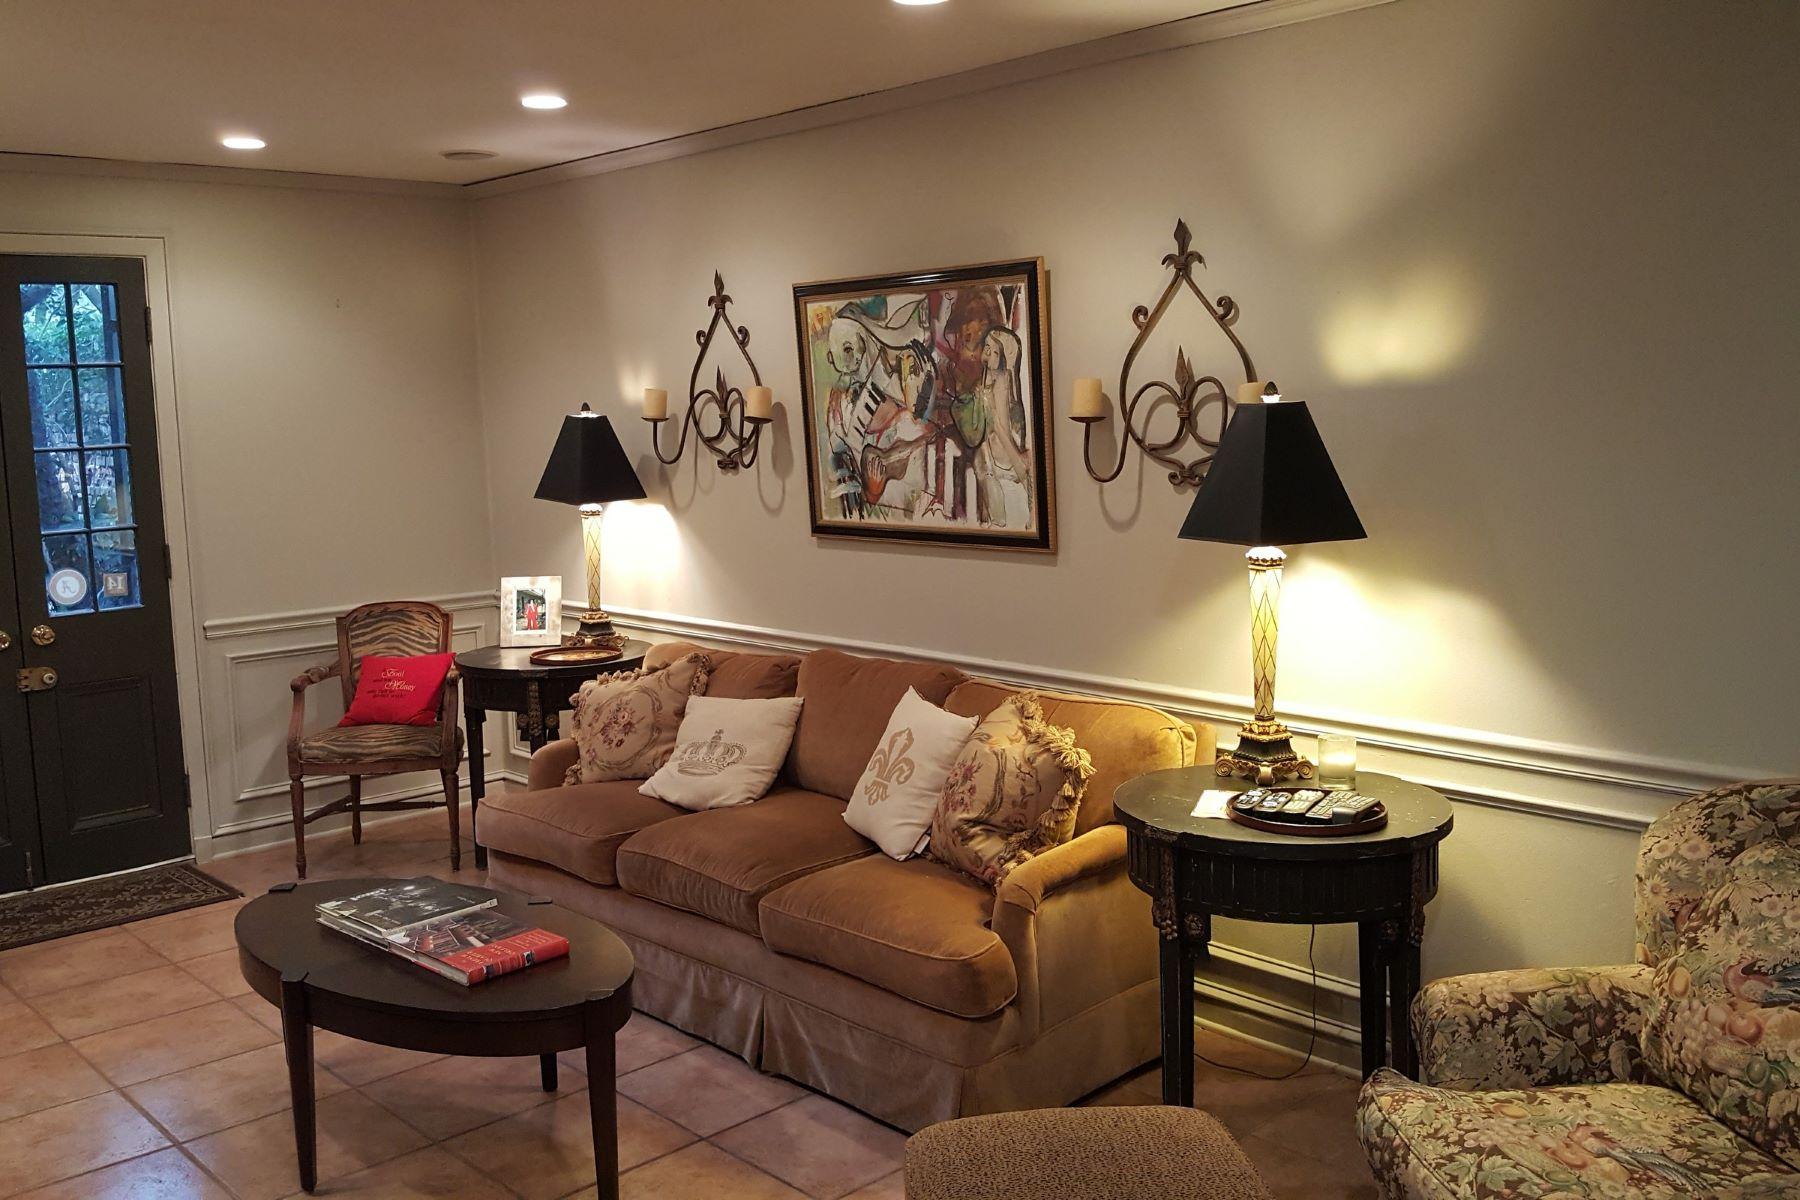 Additional photo for property listing at 1119 Dauphine St 1119 Dauphine St # 5 新奥尔良, 路易斯安那州 70116 美国